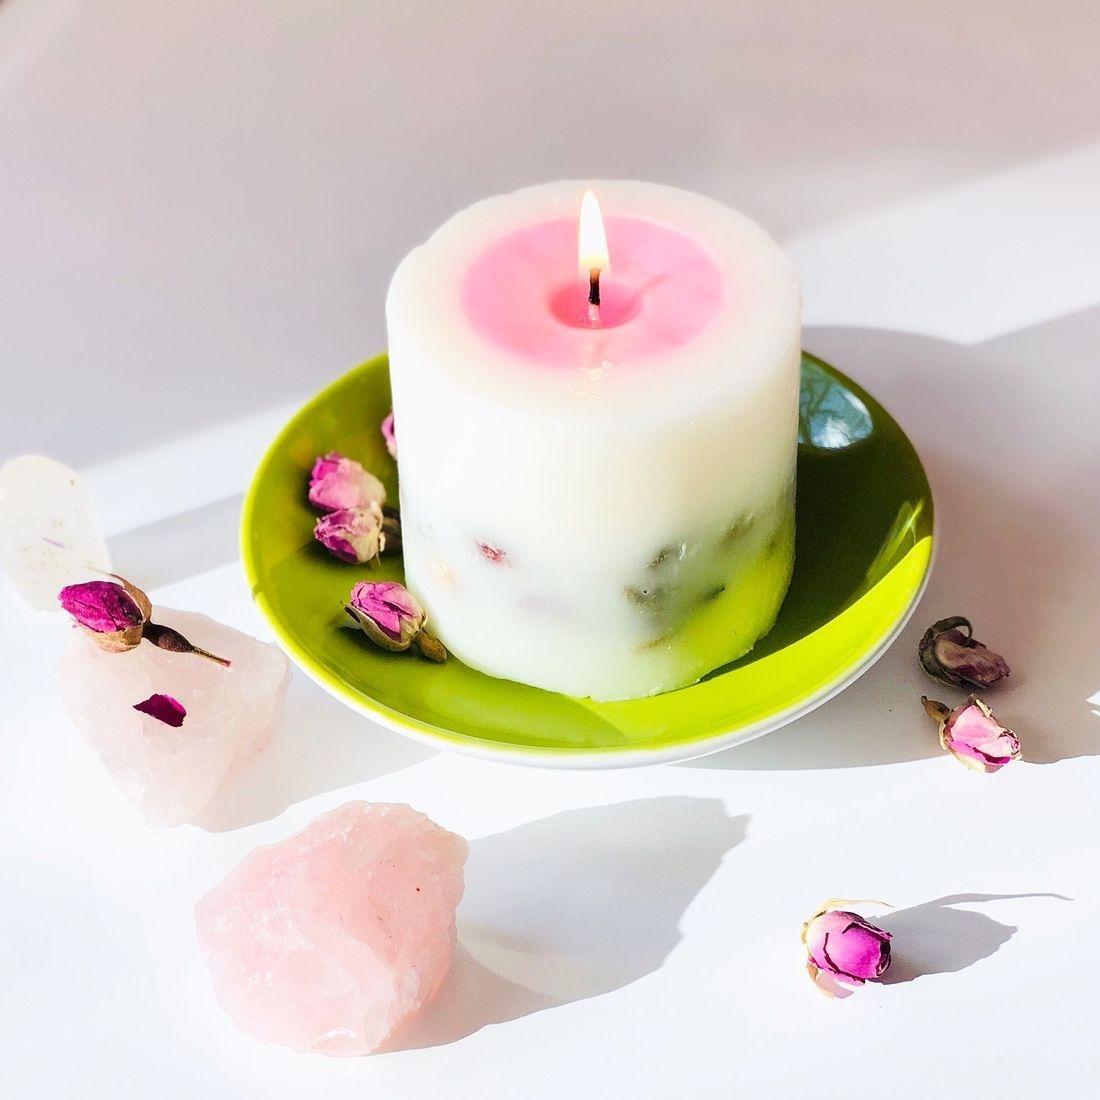 clean rose beauty, rose candle, rose natural oil rose essential oil, rosepost box, rose-infused skincare